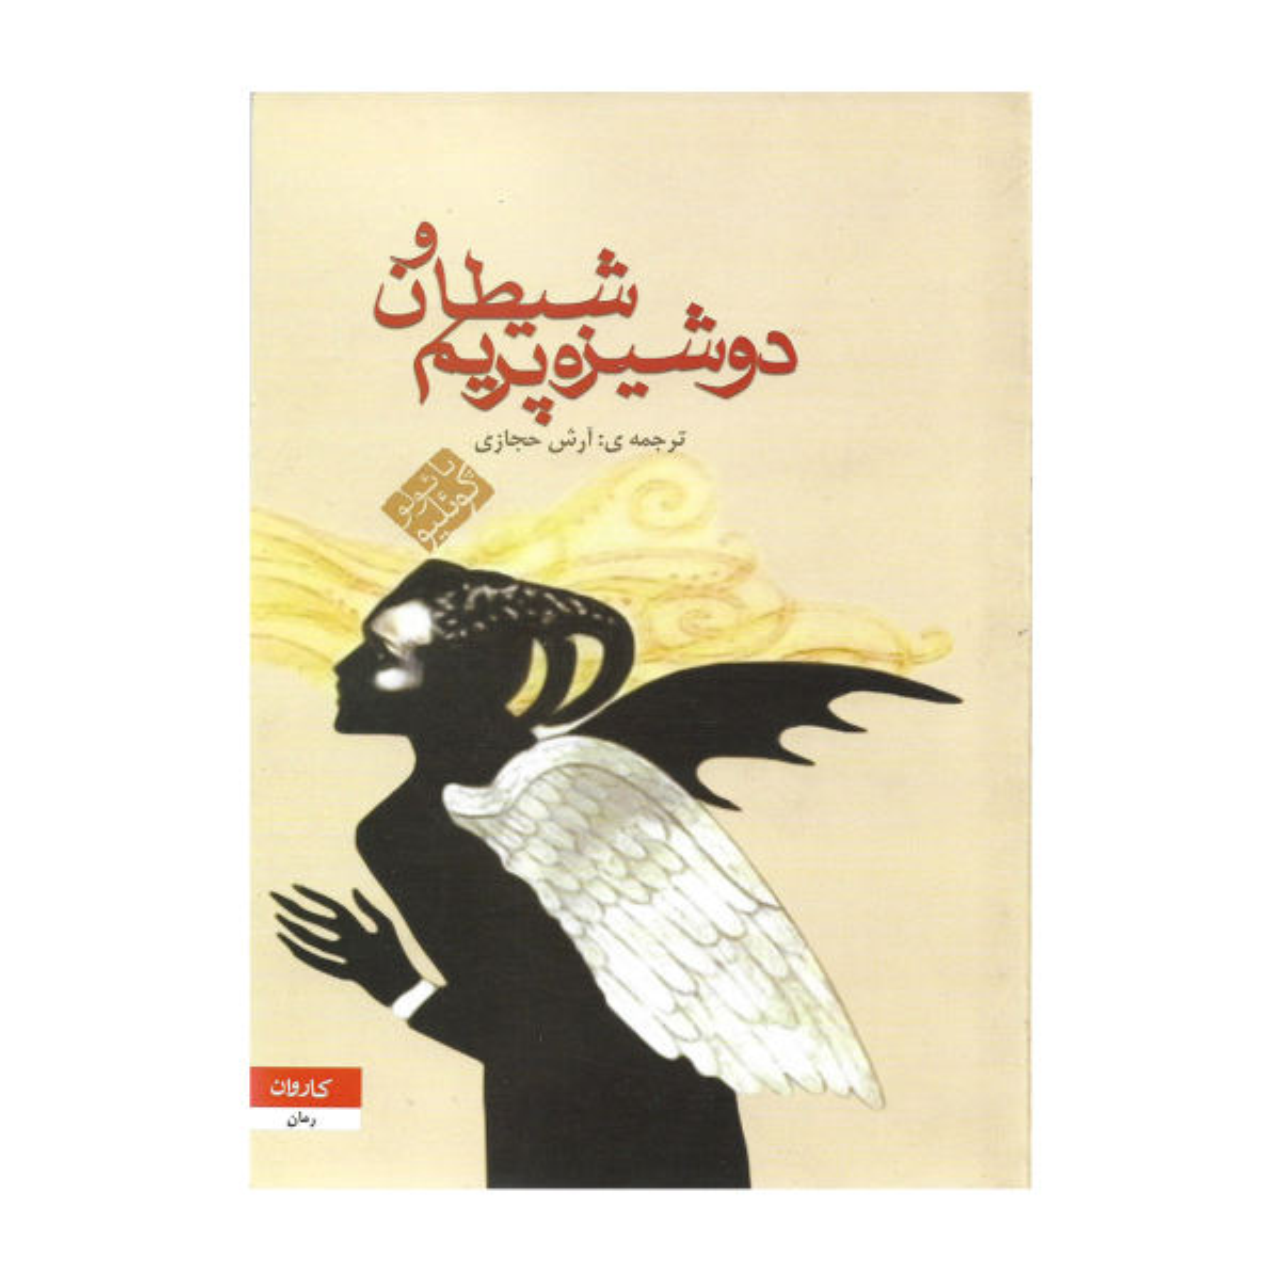 کتاب شیطان و دوشیزه پریم اثر پائولو کوئلیو